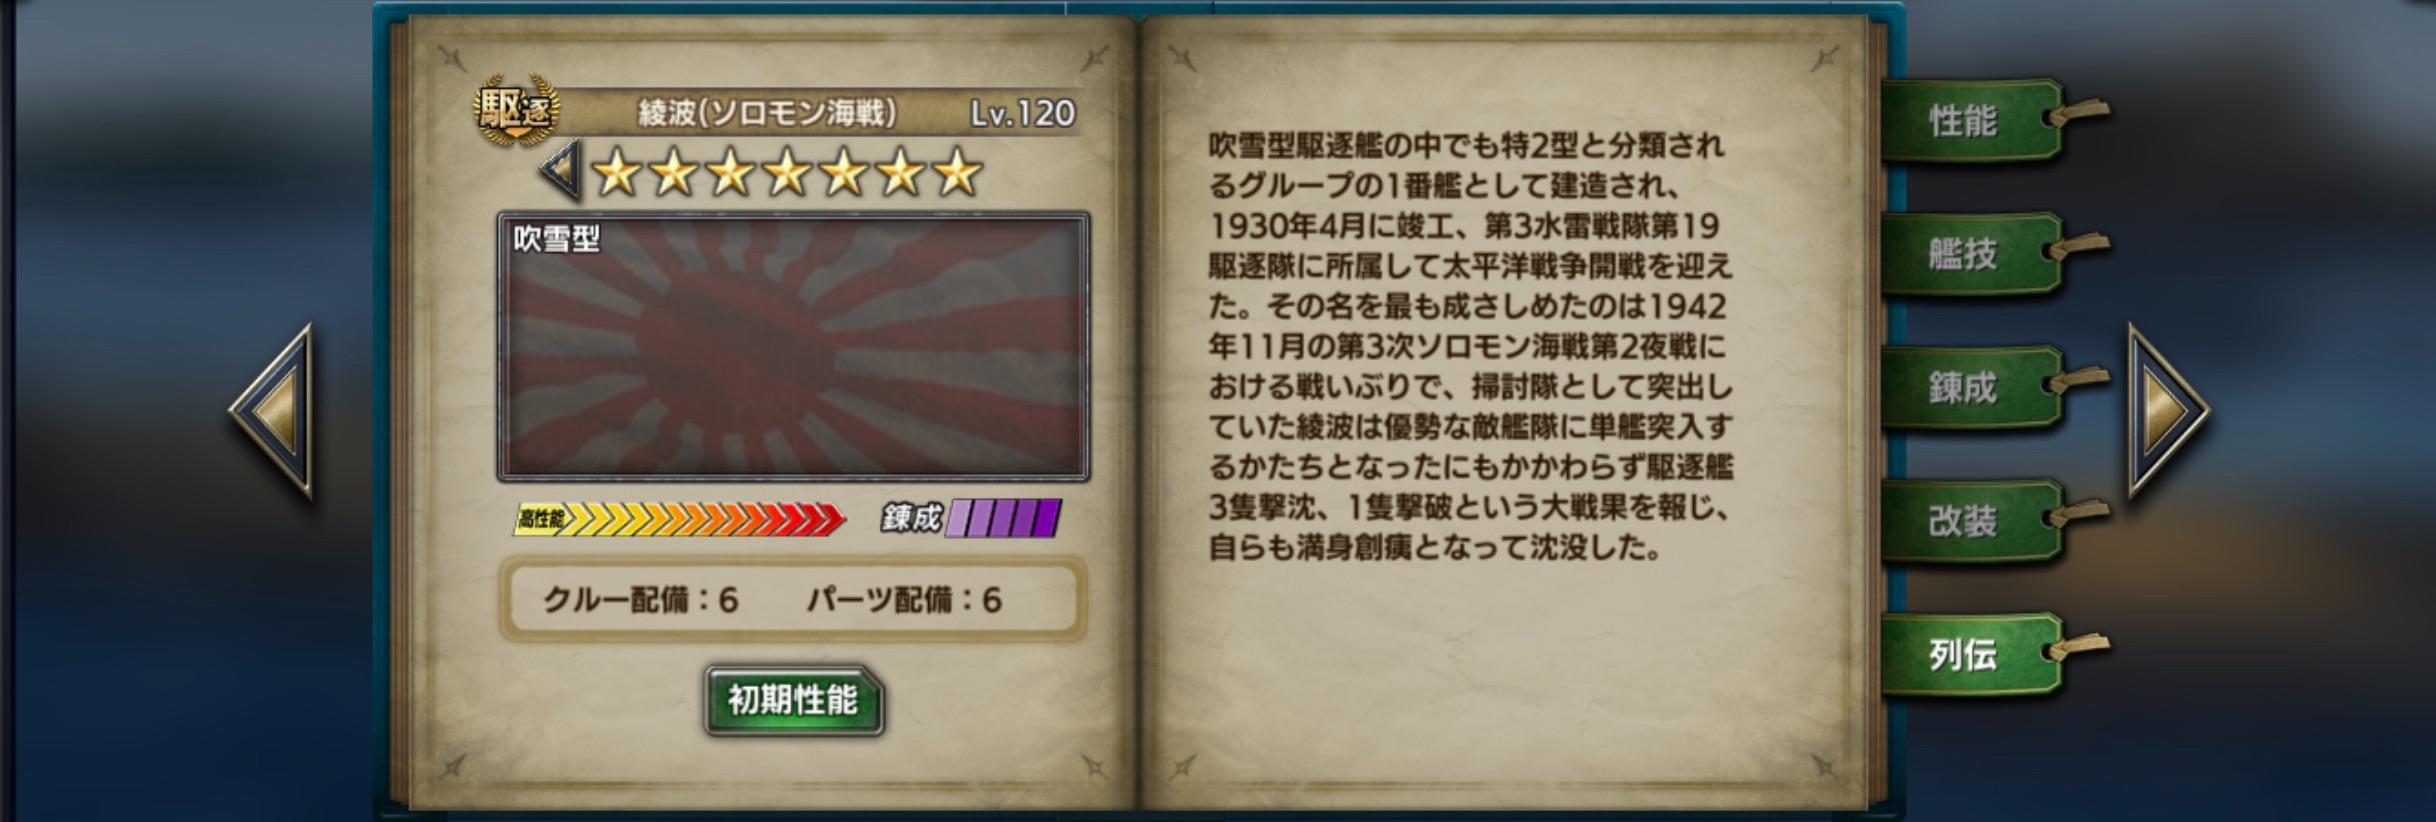 AyanamiS-history